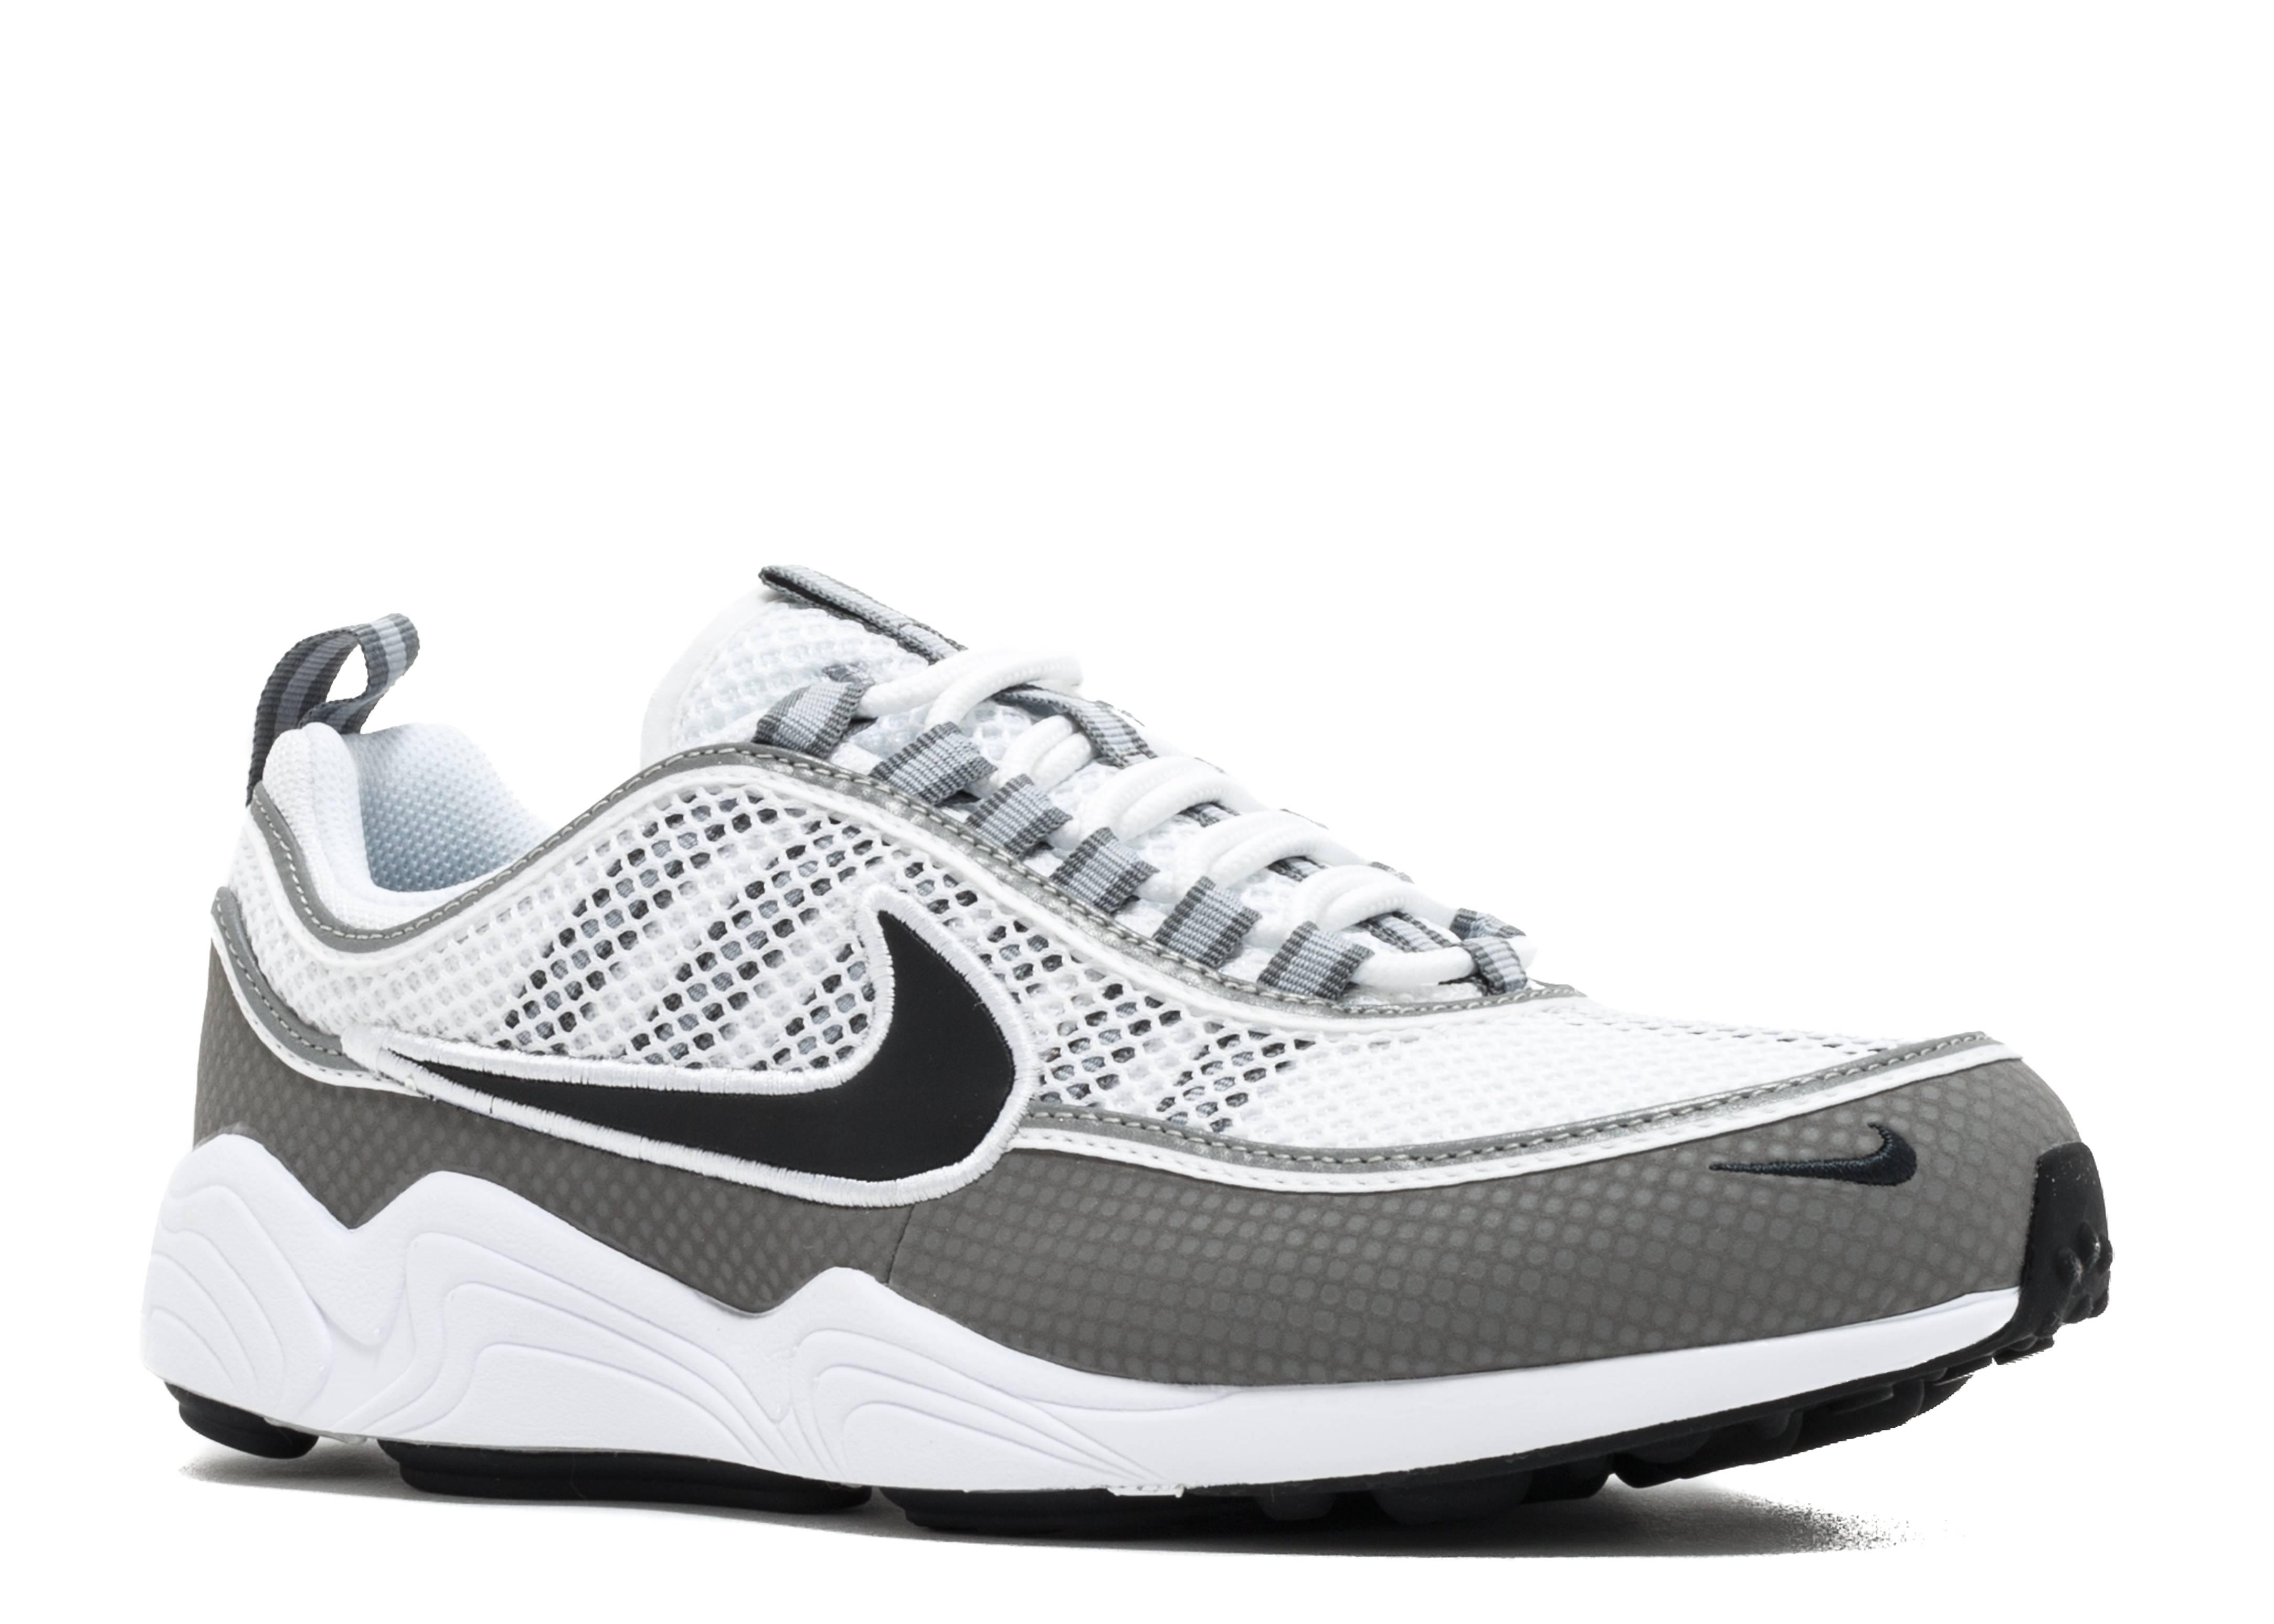 26028c9db42c Air Zoom Spiridon - Nike - 849776 101 - white black-white ash ...